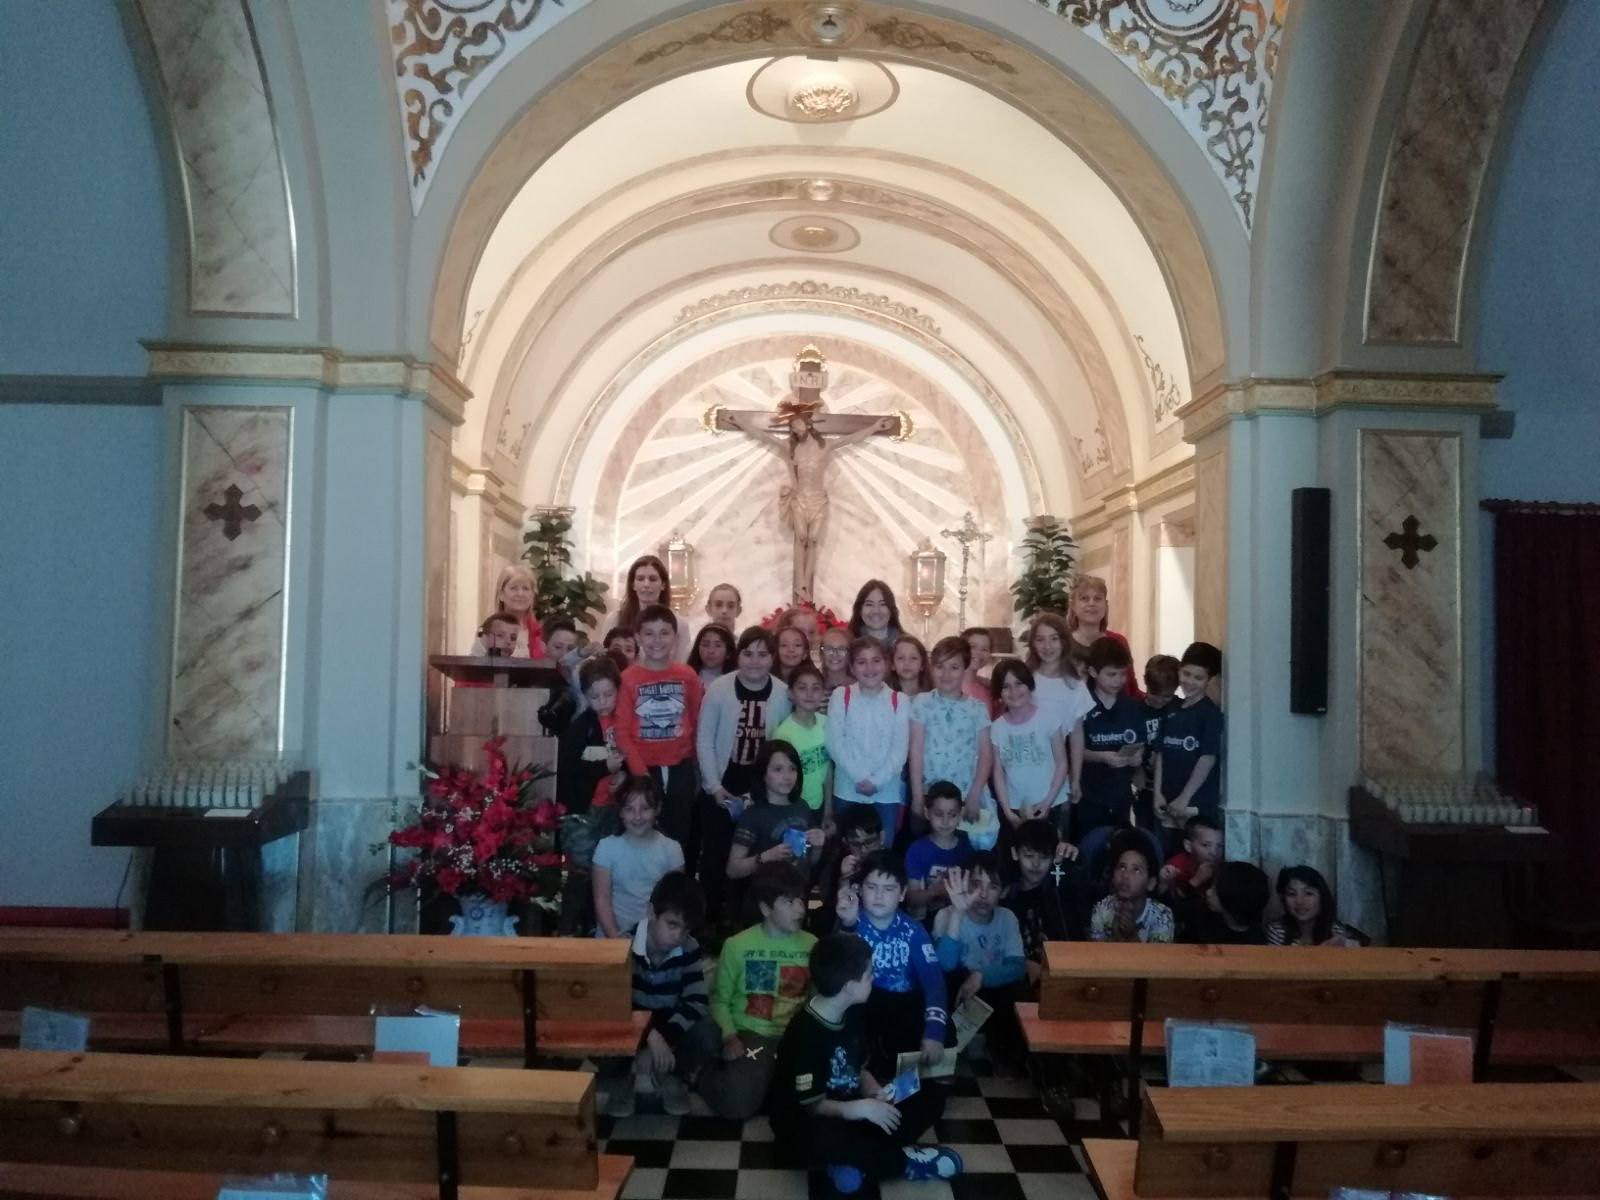 (2018-04-18) - Visita ermita alumnos Beatriz-Carmina-Lucía,3º,La Foia - María Isabel Berenguer Brotons - (03)